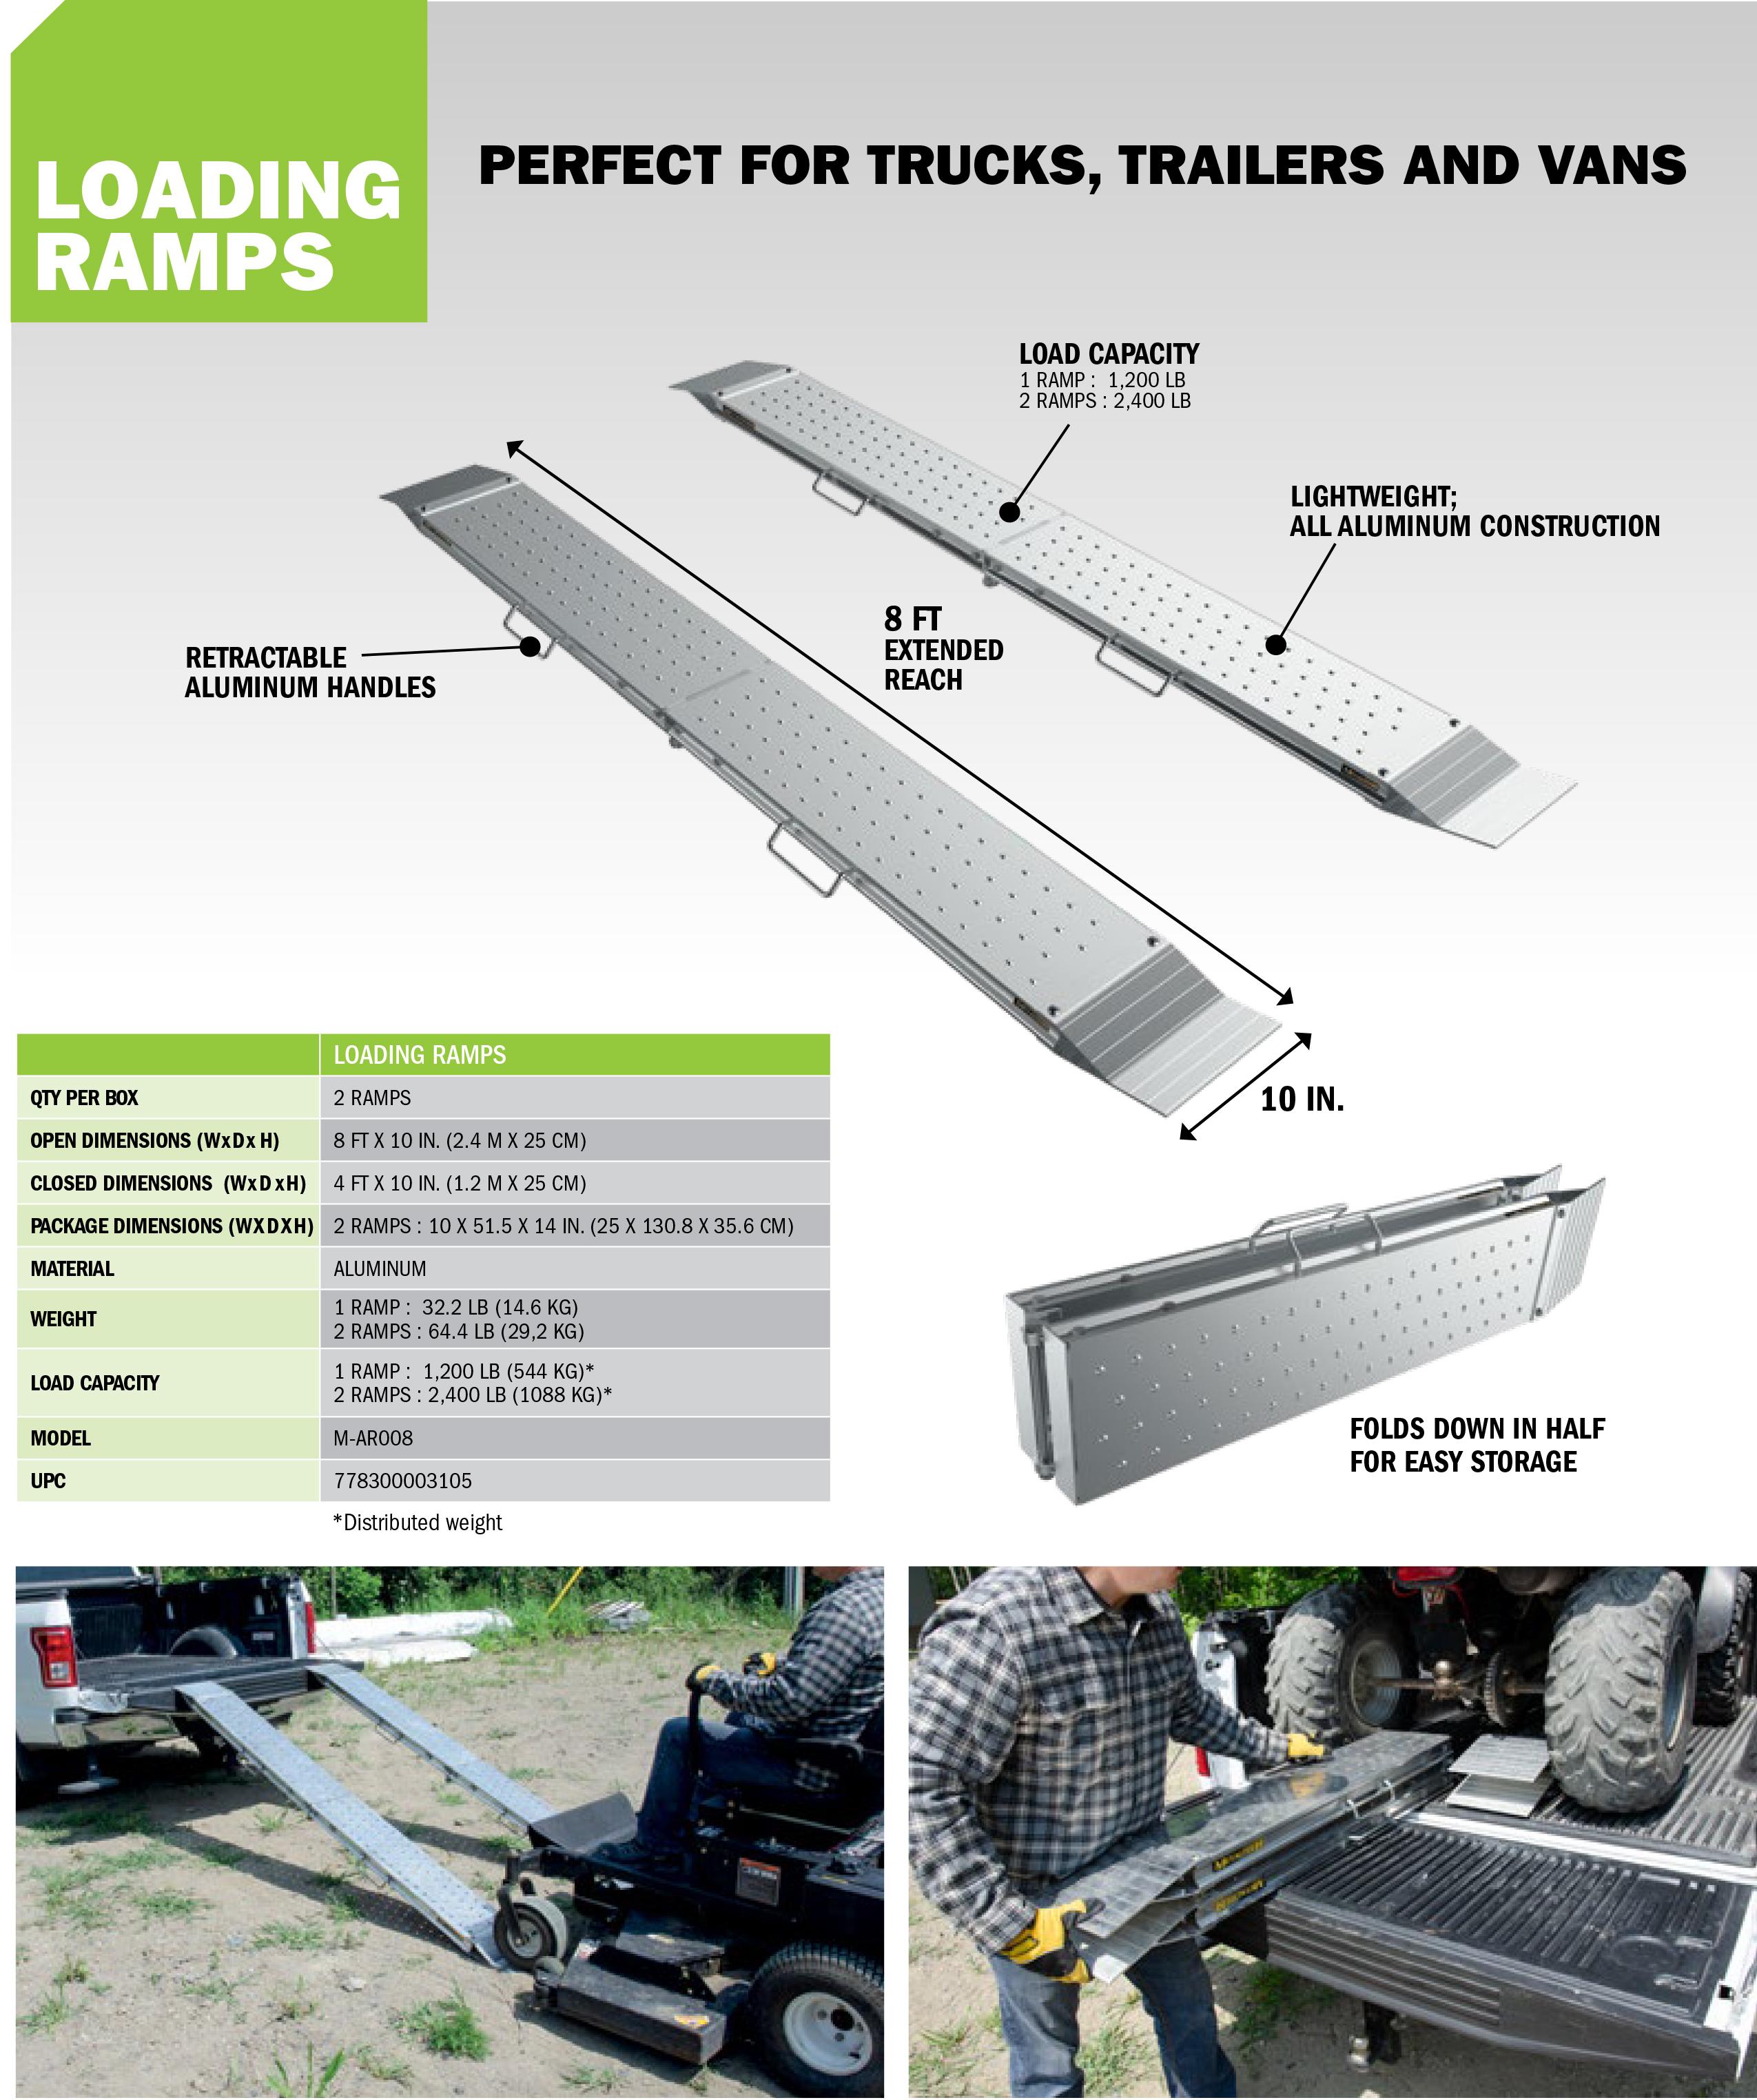 metaltech-loading-ramps-2.jpg